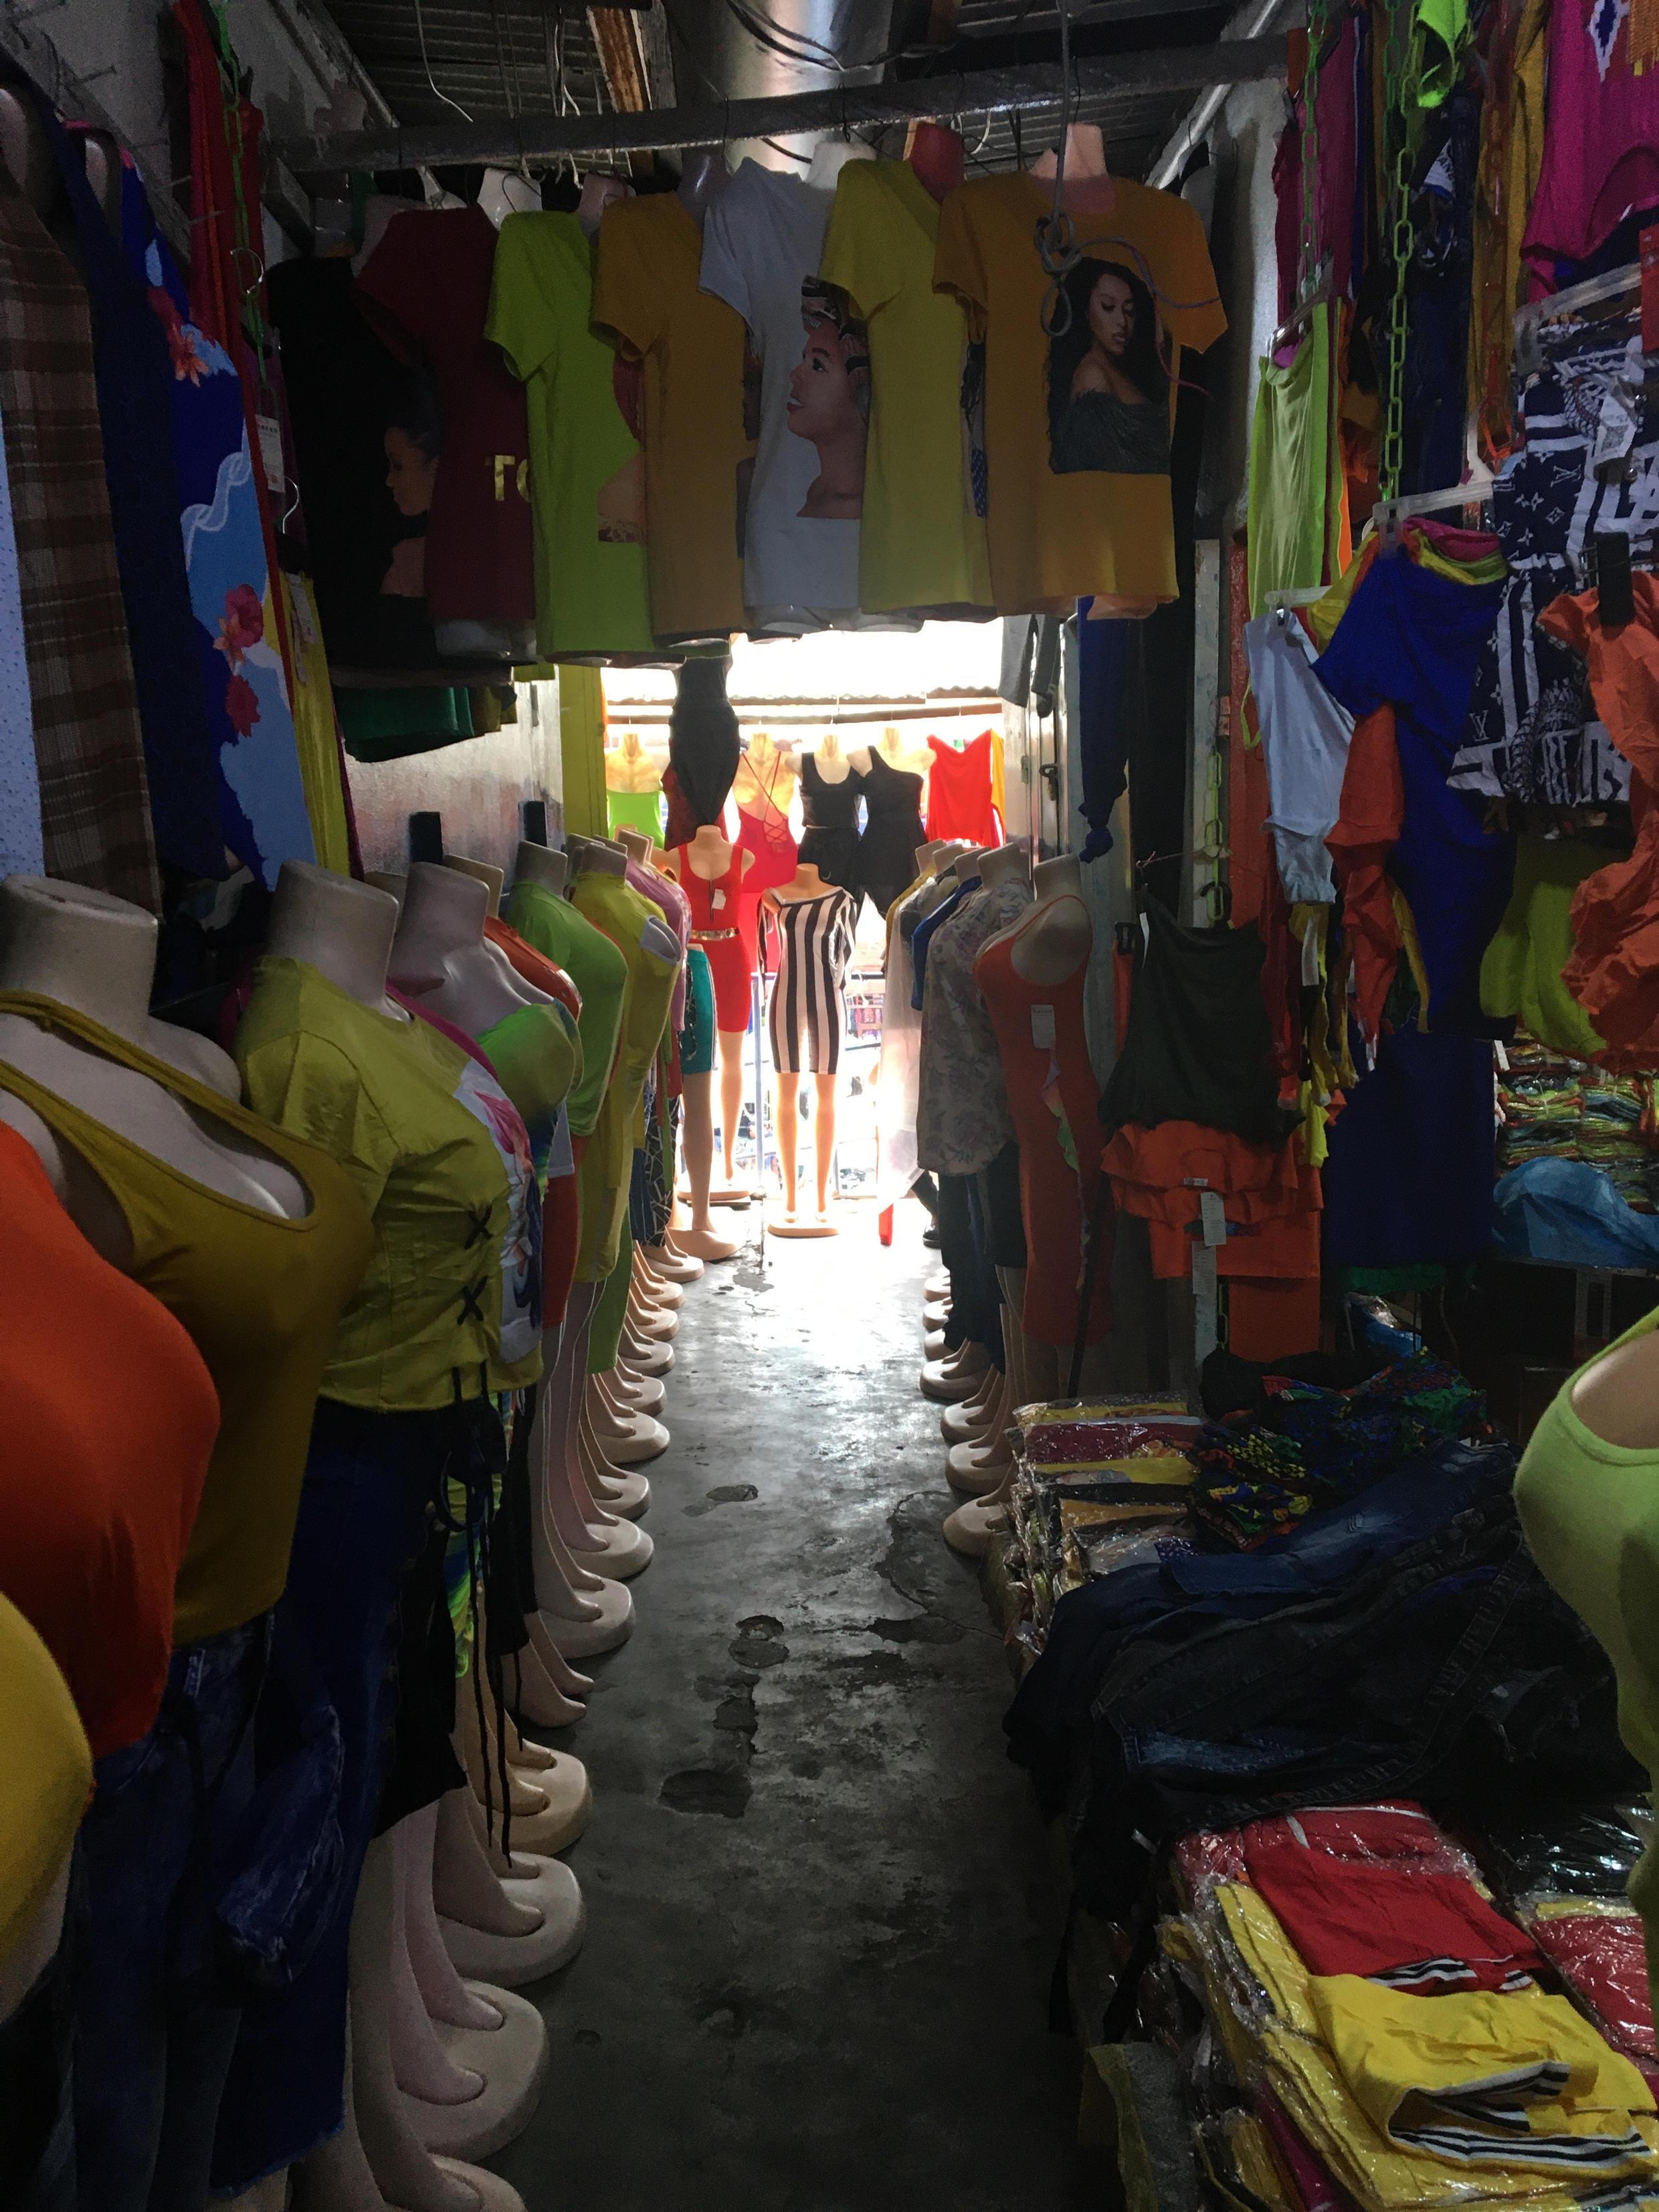 No customers buying clothes at the China Market building.